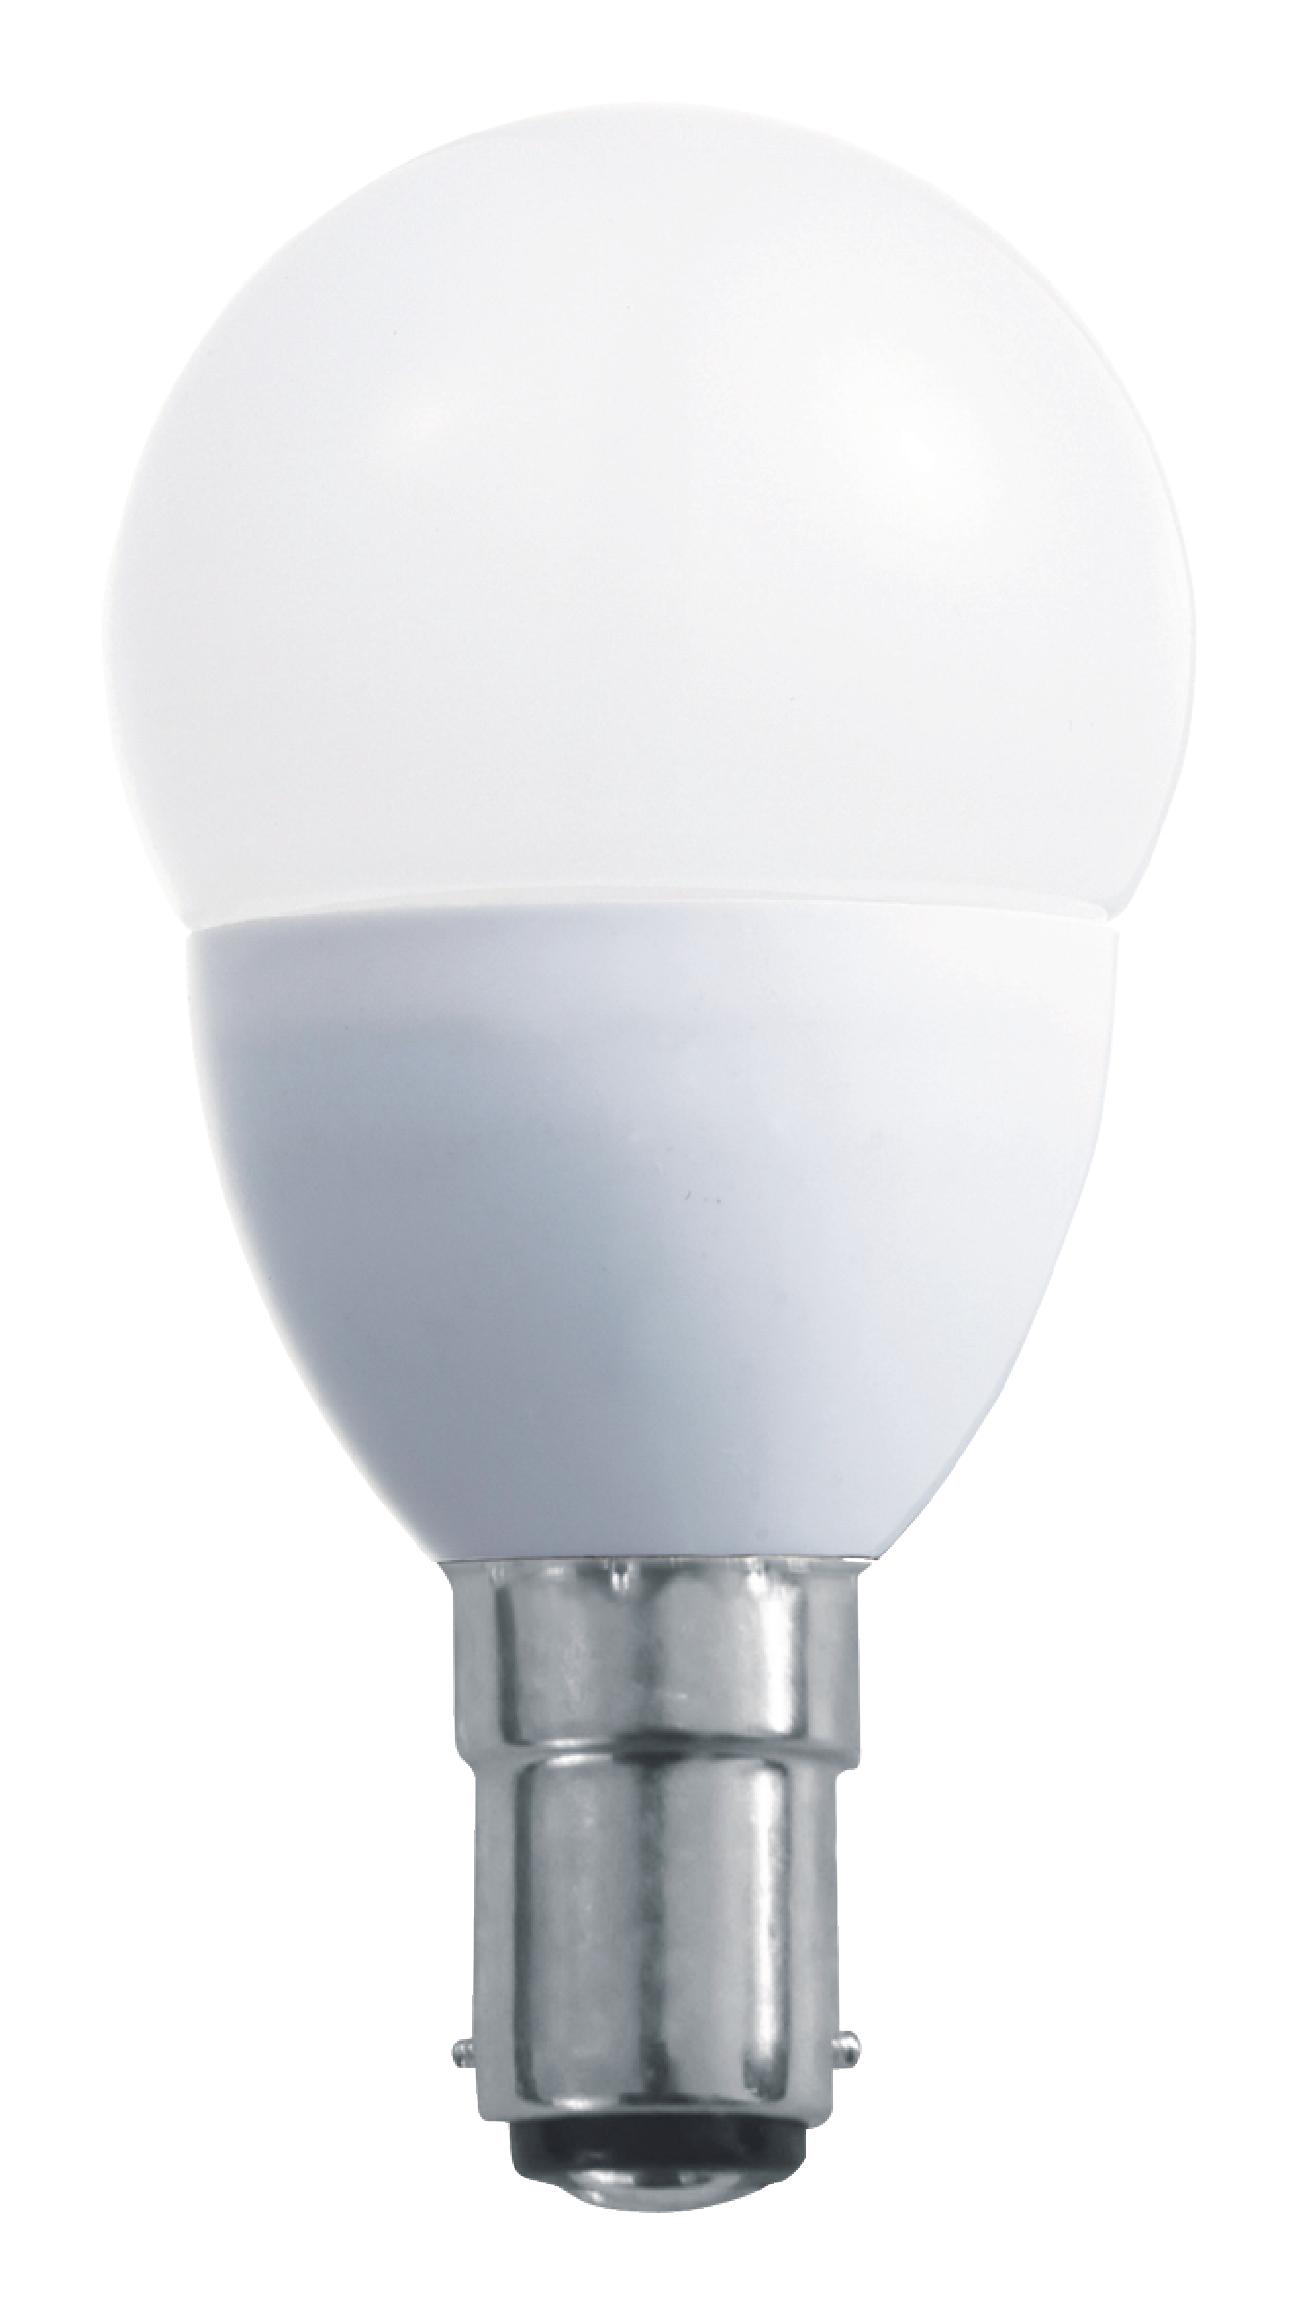 hqlb15mini001 hq led lamp b15 mini globe 3 5 w 250 lm. Black Bedroom Furniture Sets. Home Design Ideas